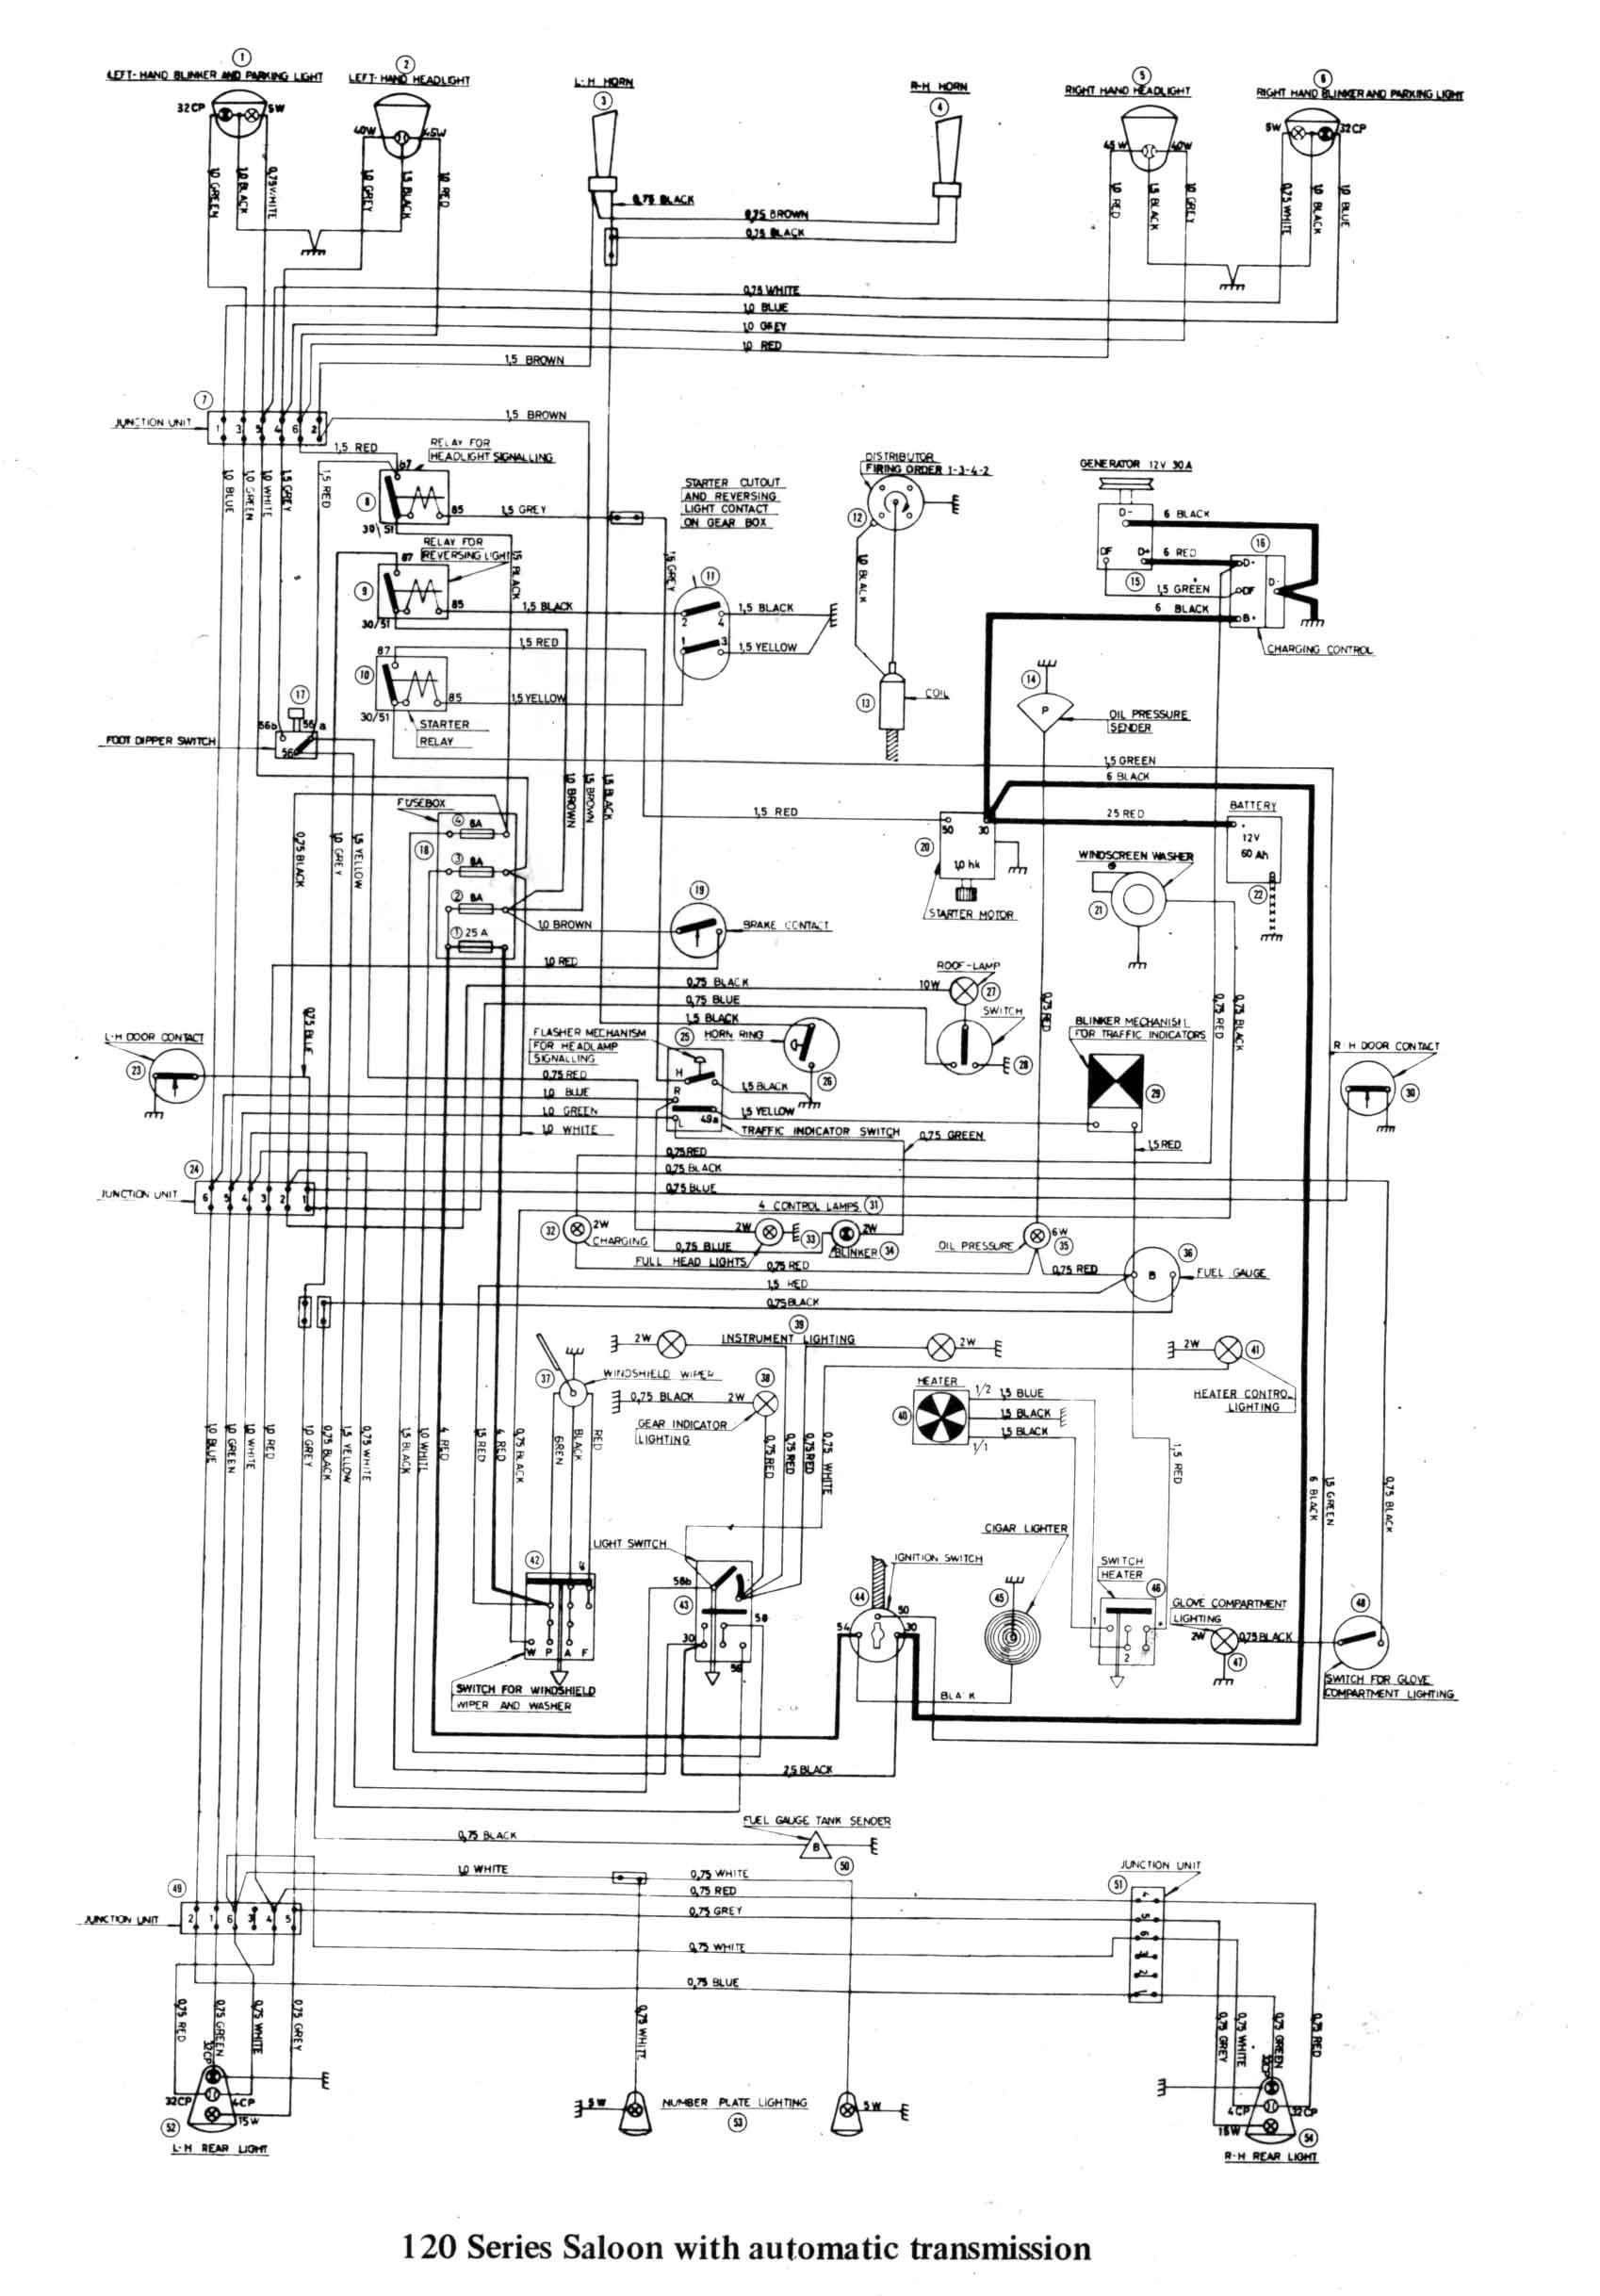 Vw 2 0 Engine Diagram Automatic Transmission Schematic Diagram Sw Em Od Retrofitting A Of Vw 2 0 Engine Diagram